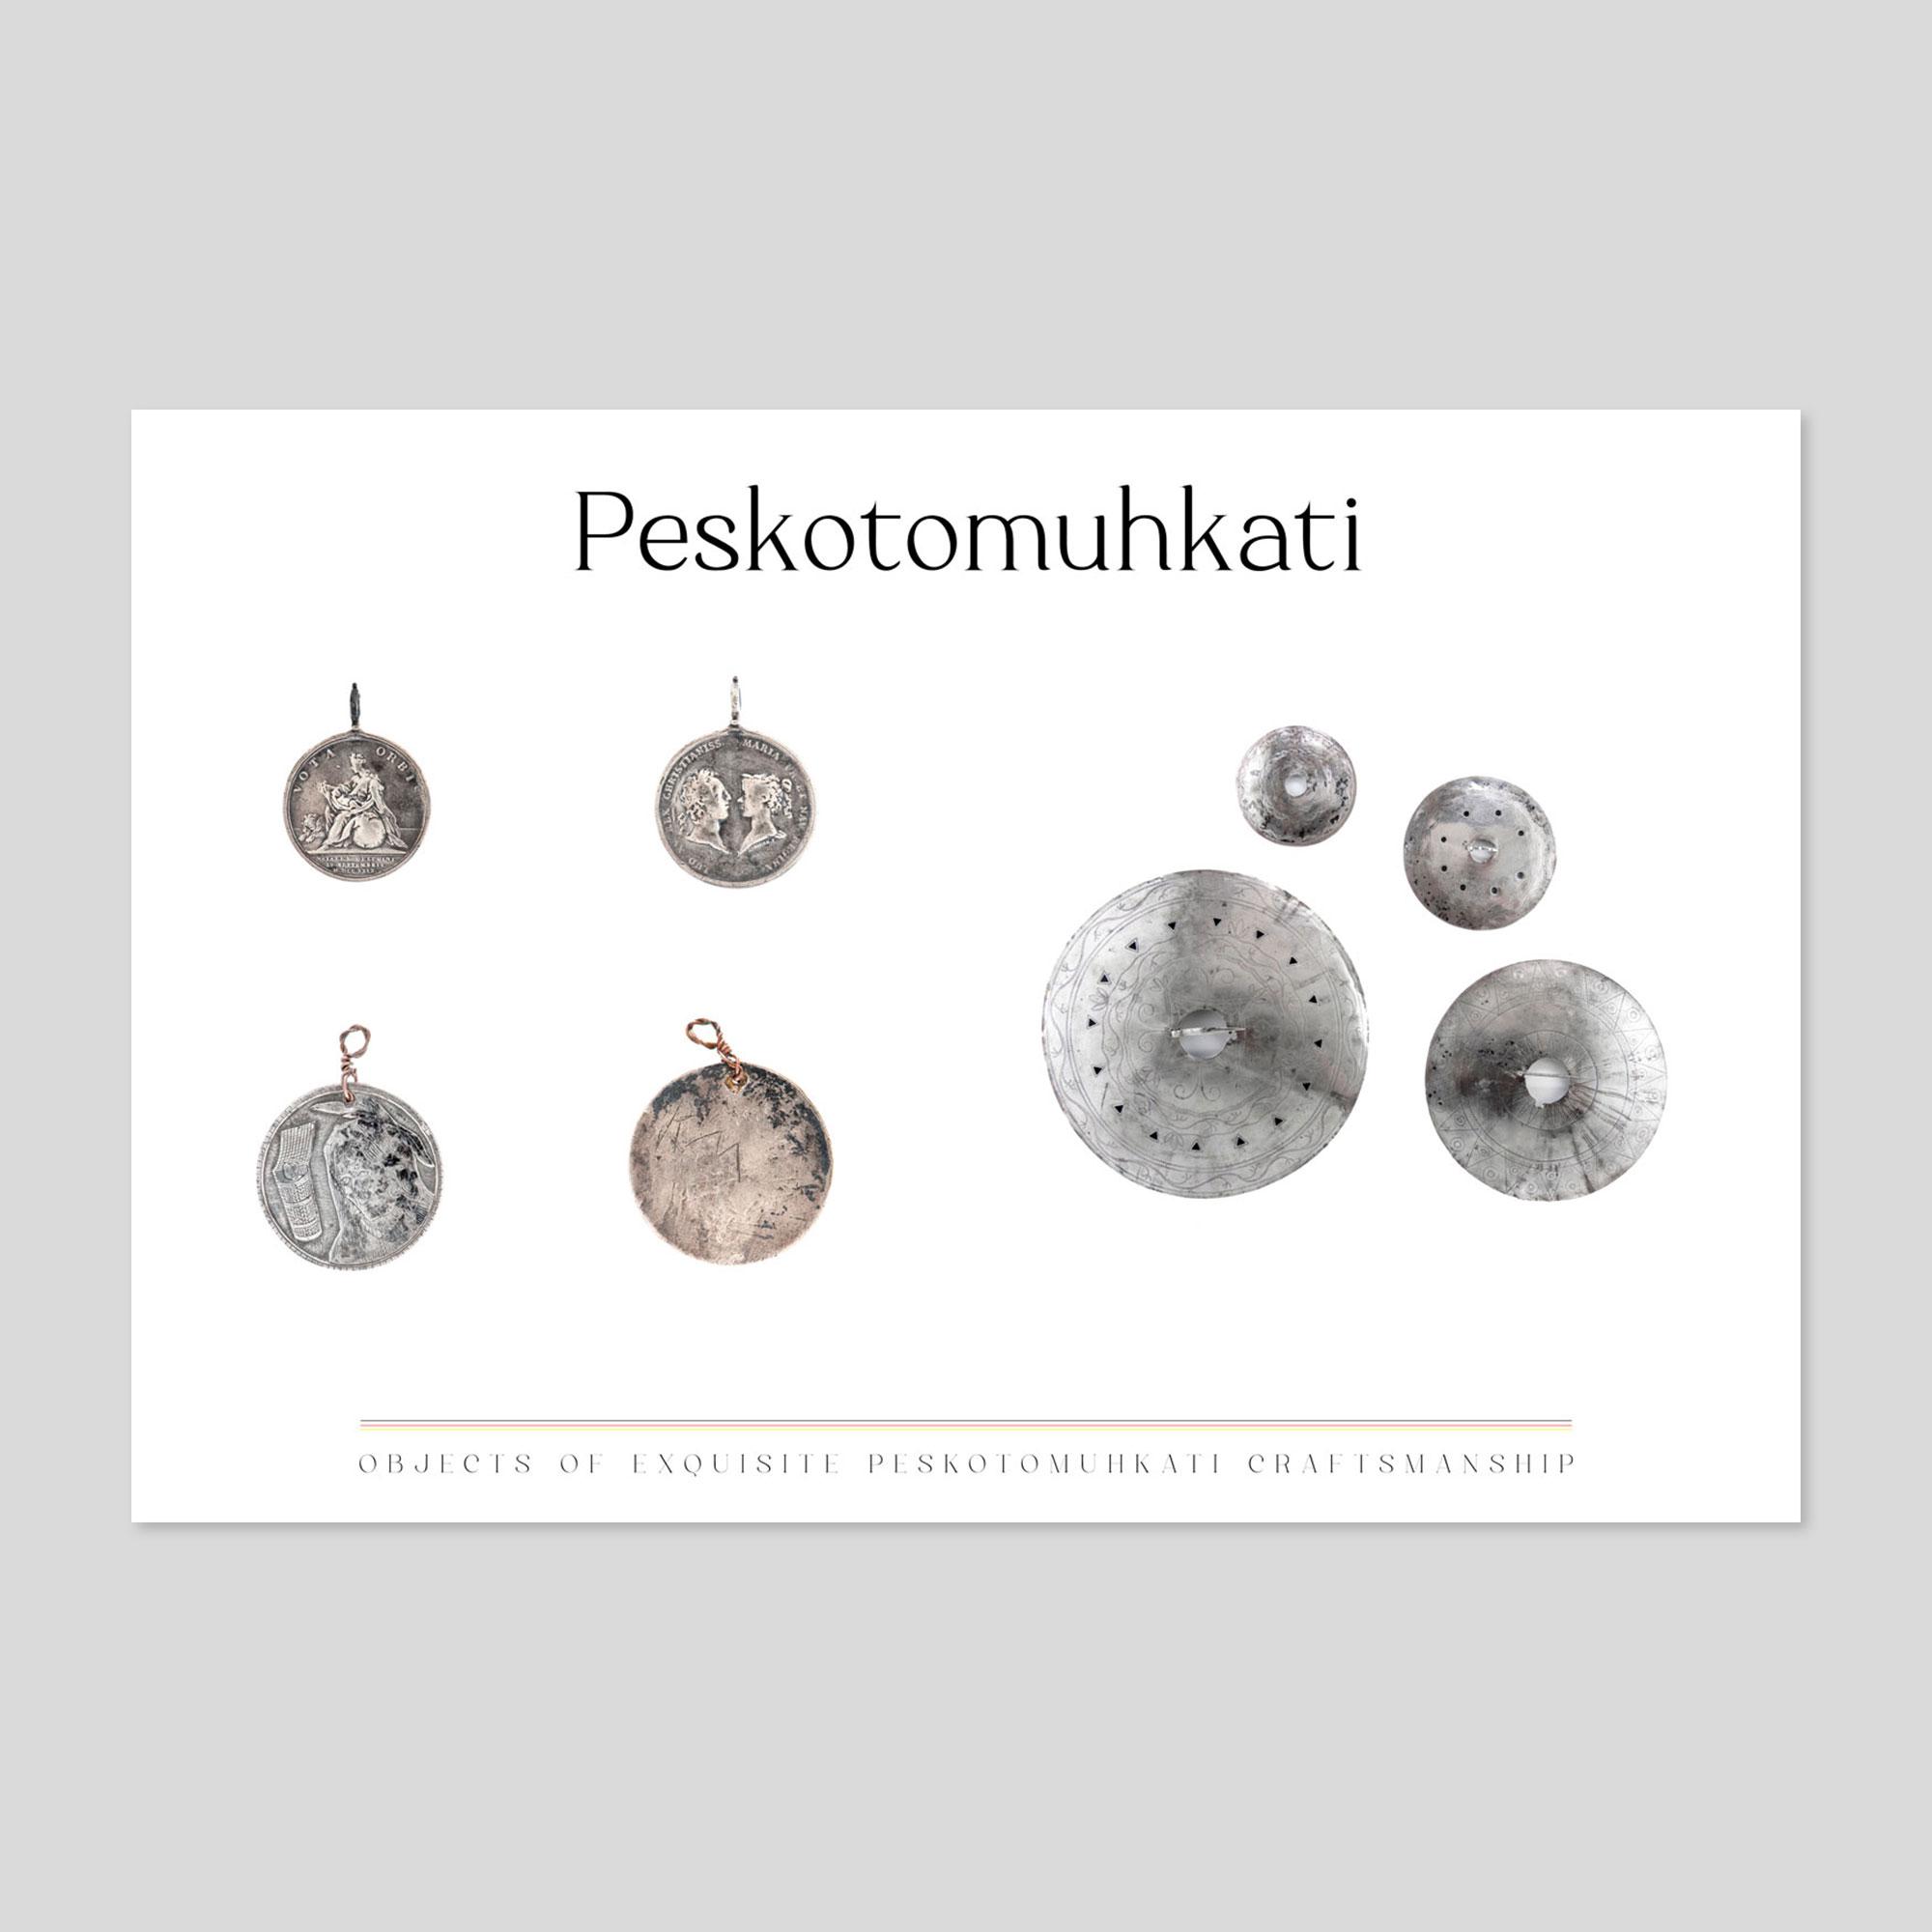 006-peskotomuhkati-silver-coins-medallions-noskonomakon-web